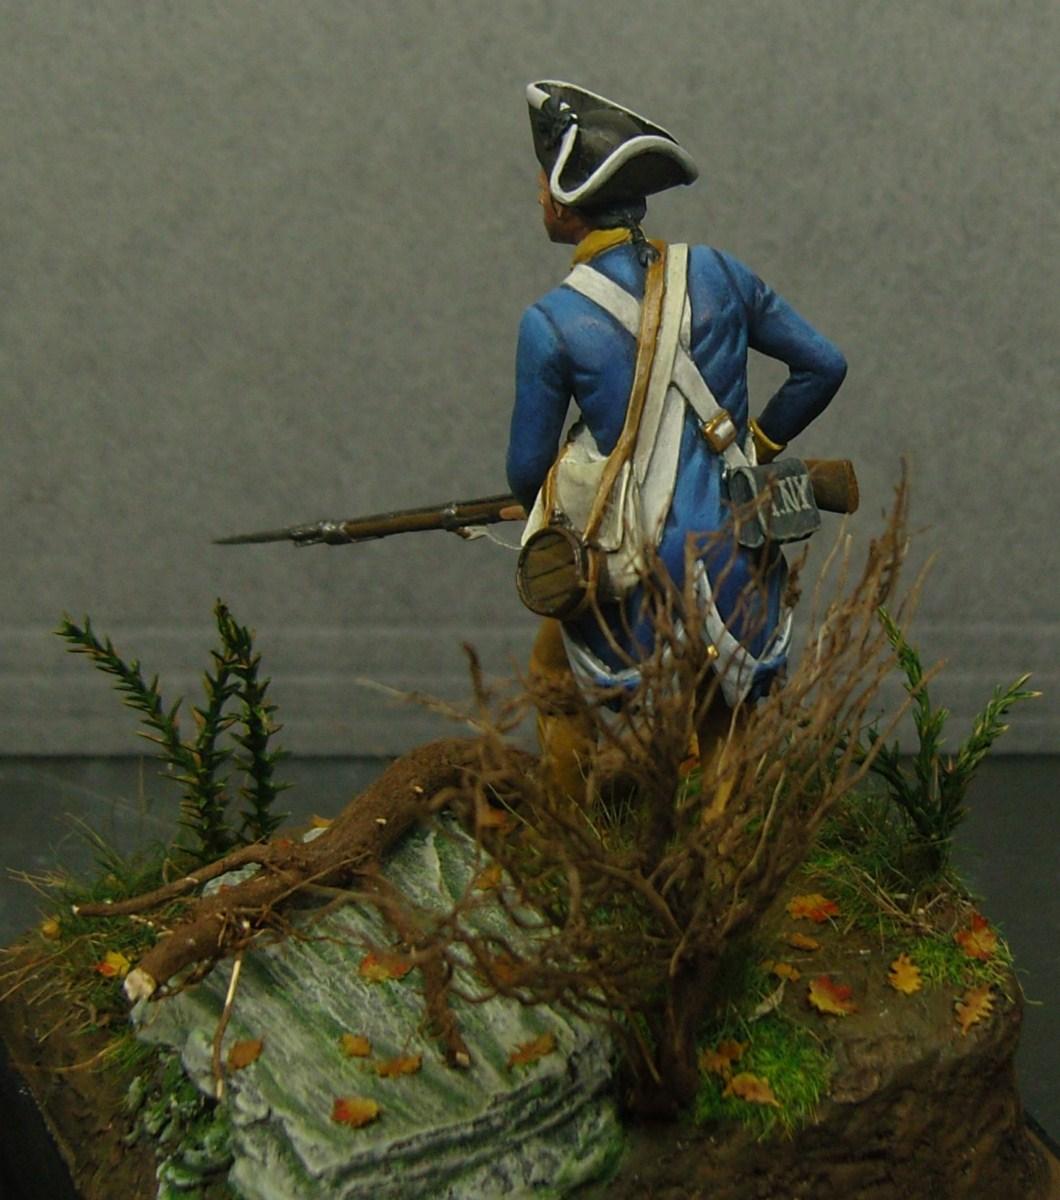 US Revolutionary Infantryman, 1780 - Page 7 120304052735699799532448